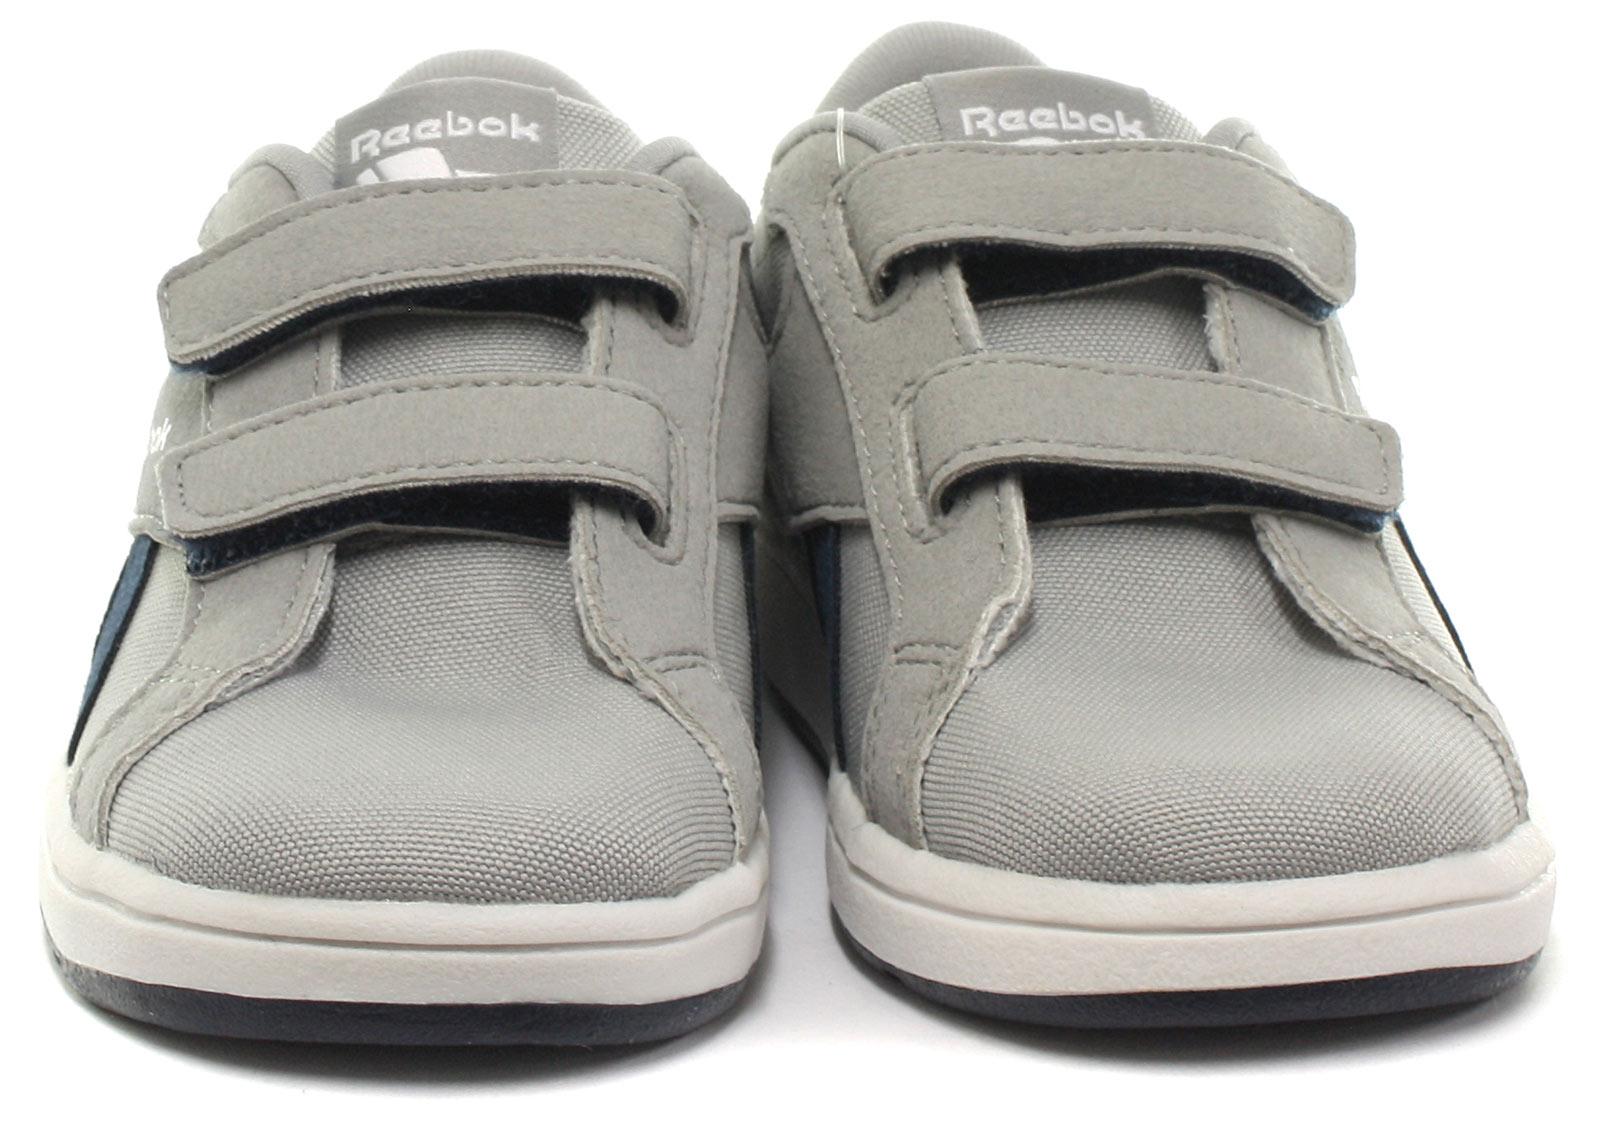 Reebok Classic Royal Comp L2V CVS Infant   Kids Trainers ALL SIZES ... 3a423414af2